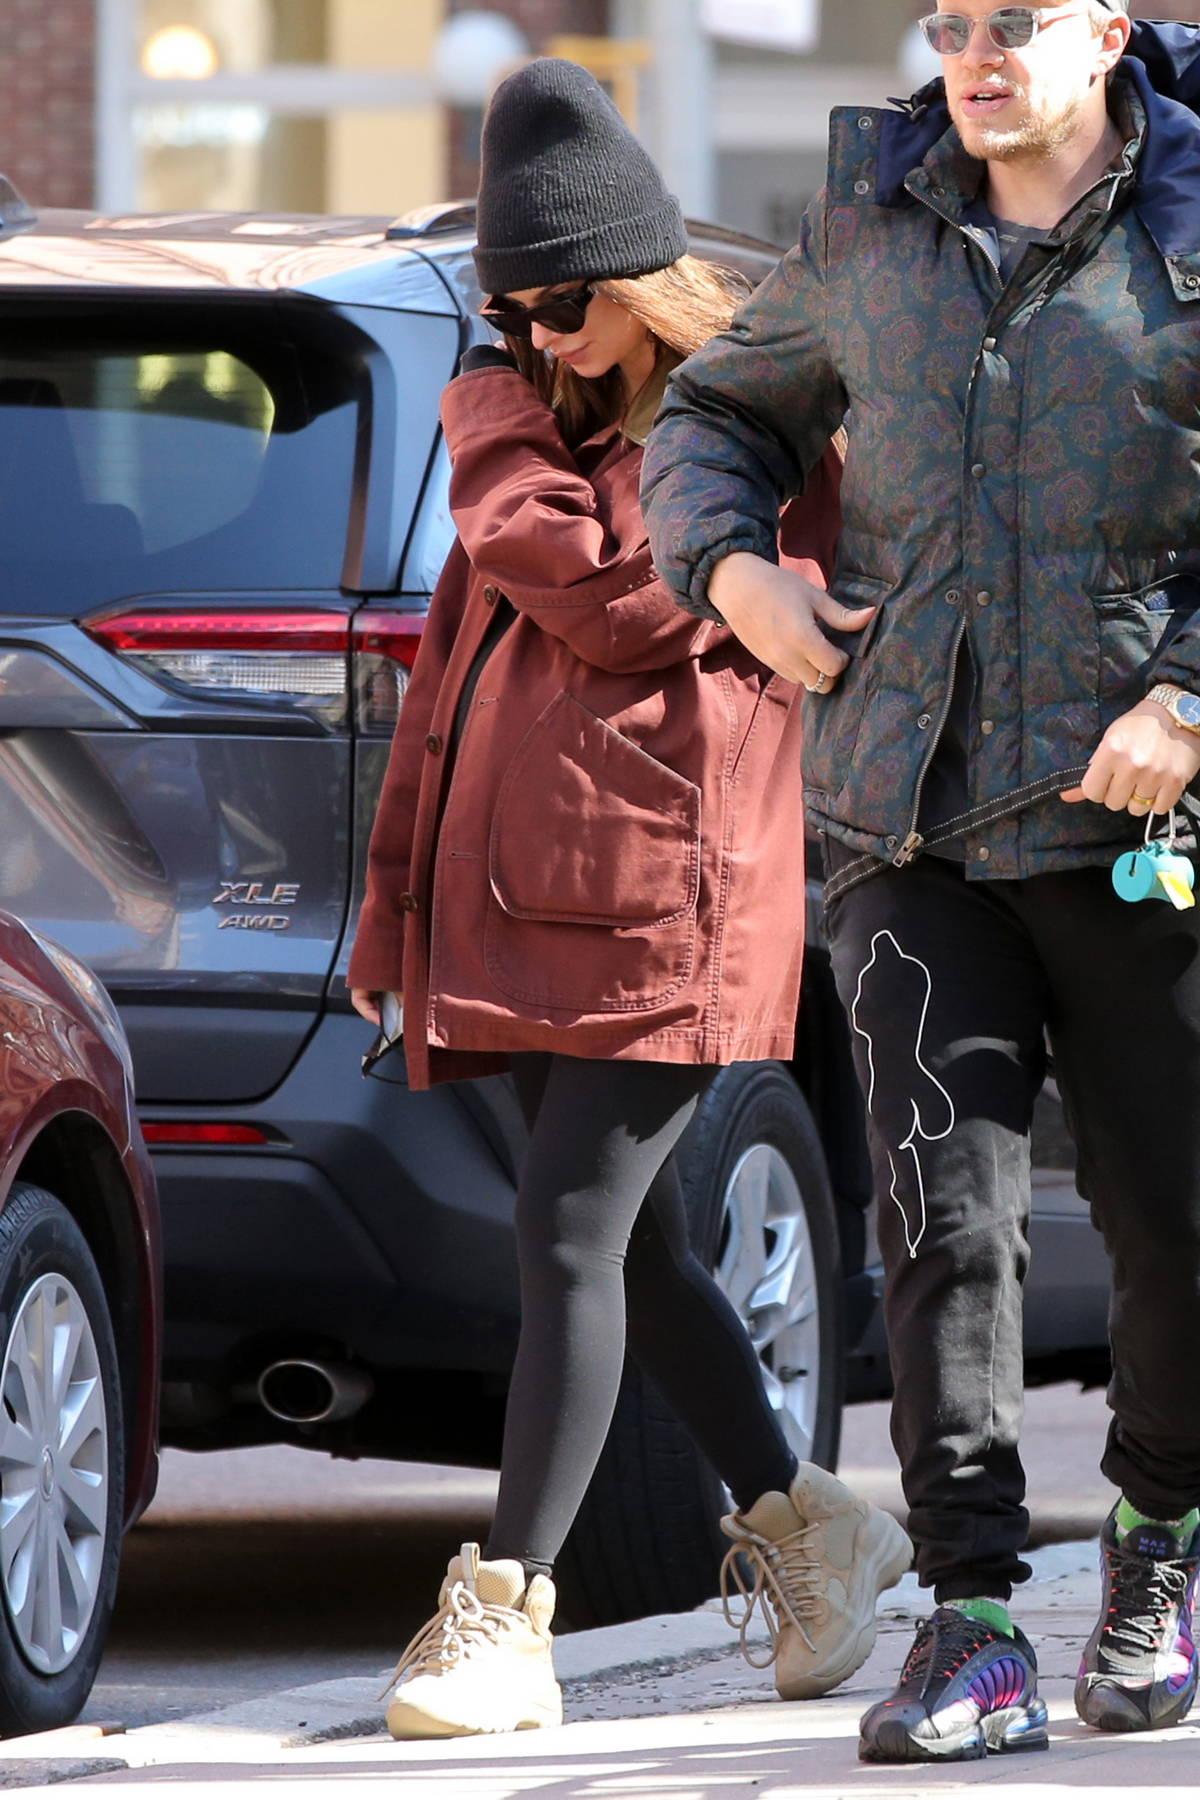 Emily Ratajkowski steps out to walk her dog Colombo with husband Sebastian Bear-McClard in New York City